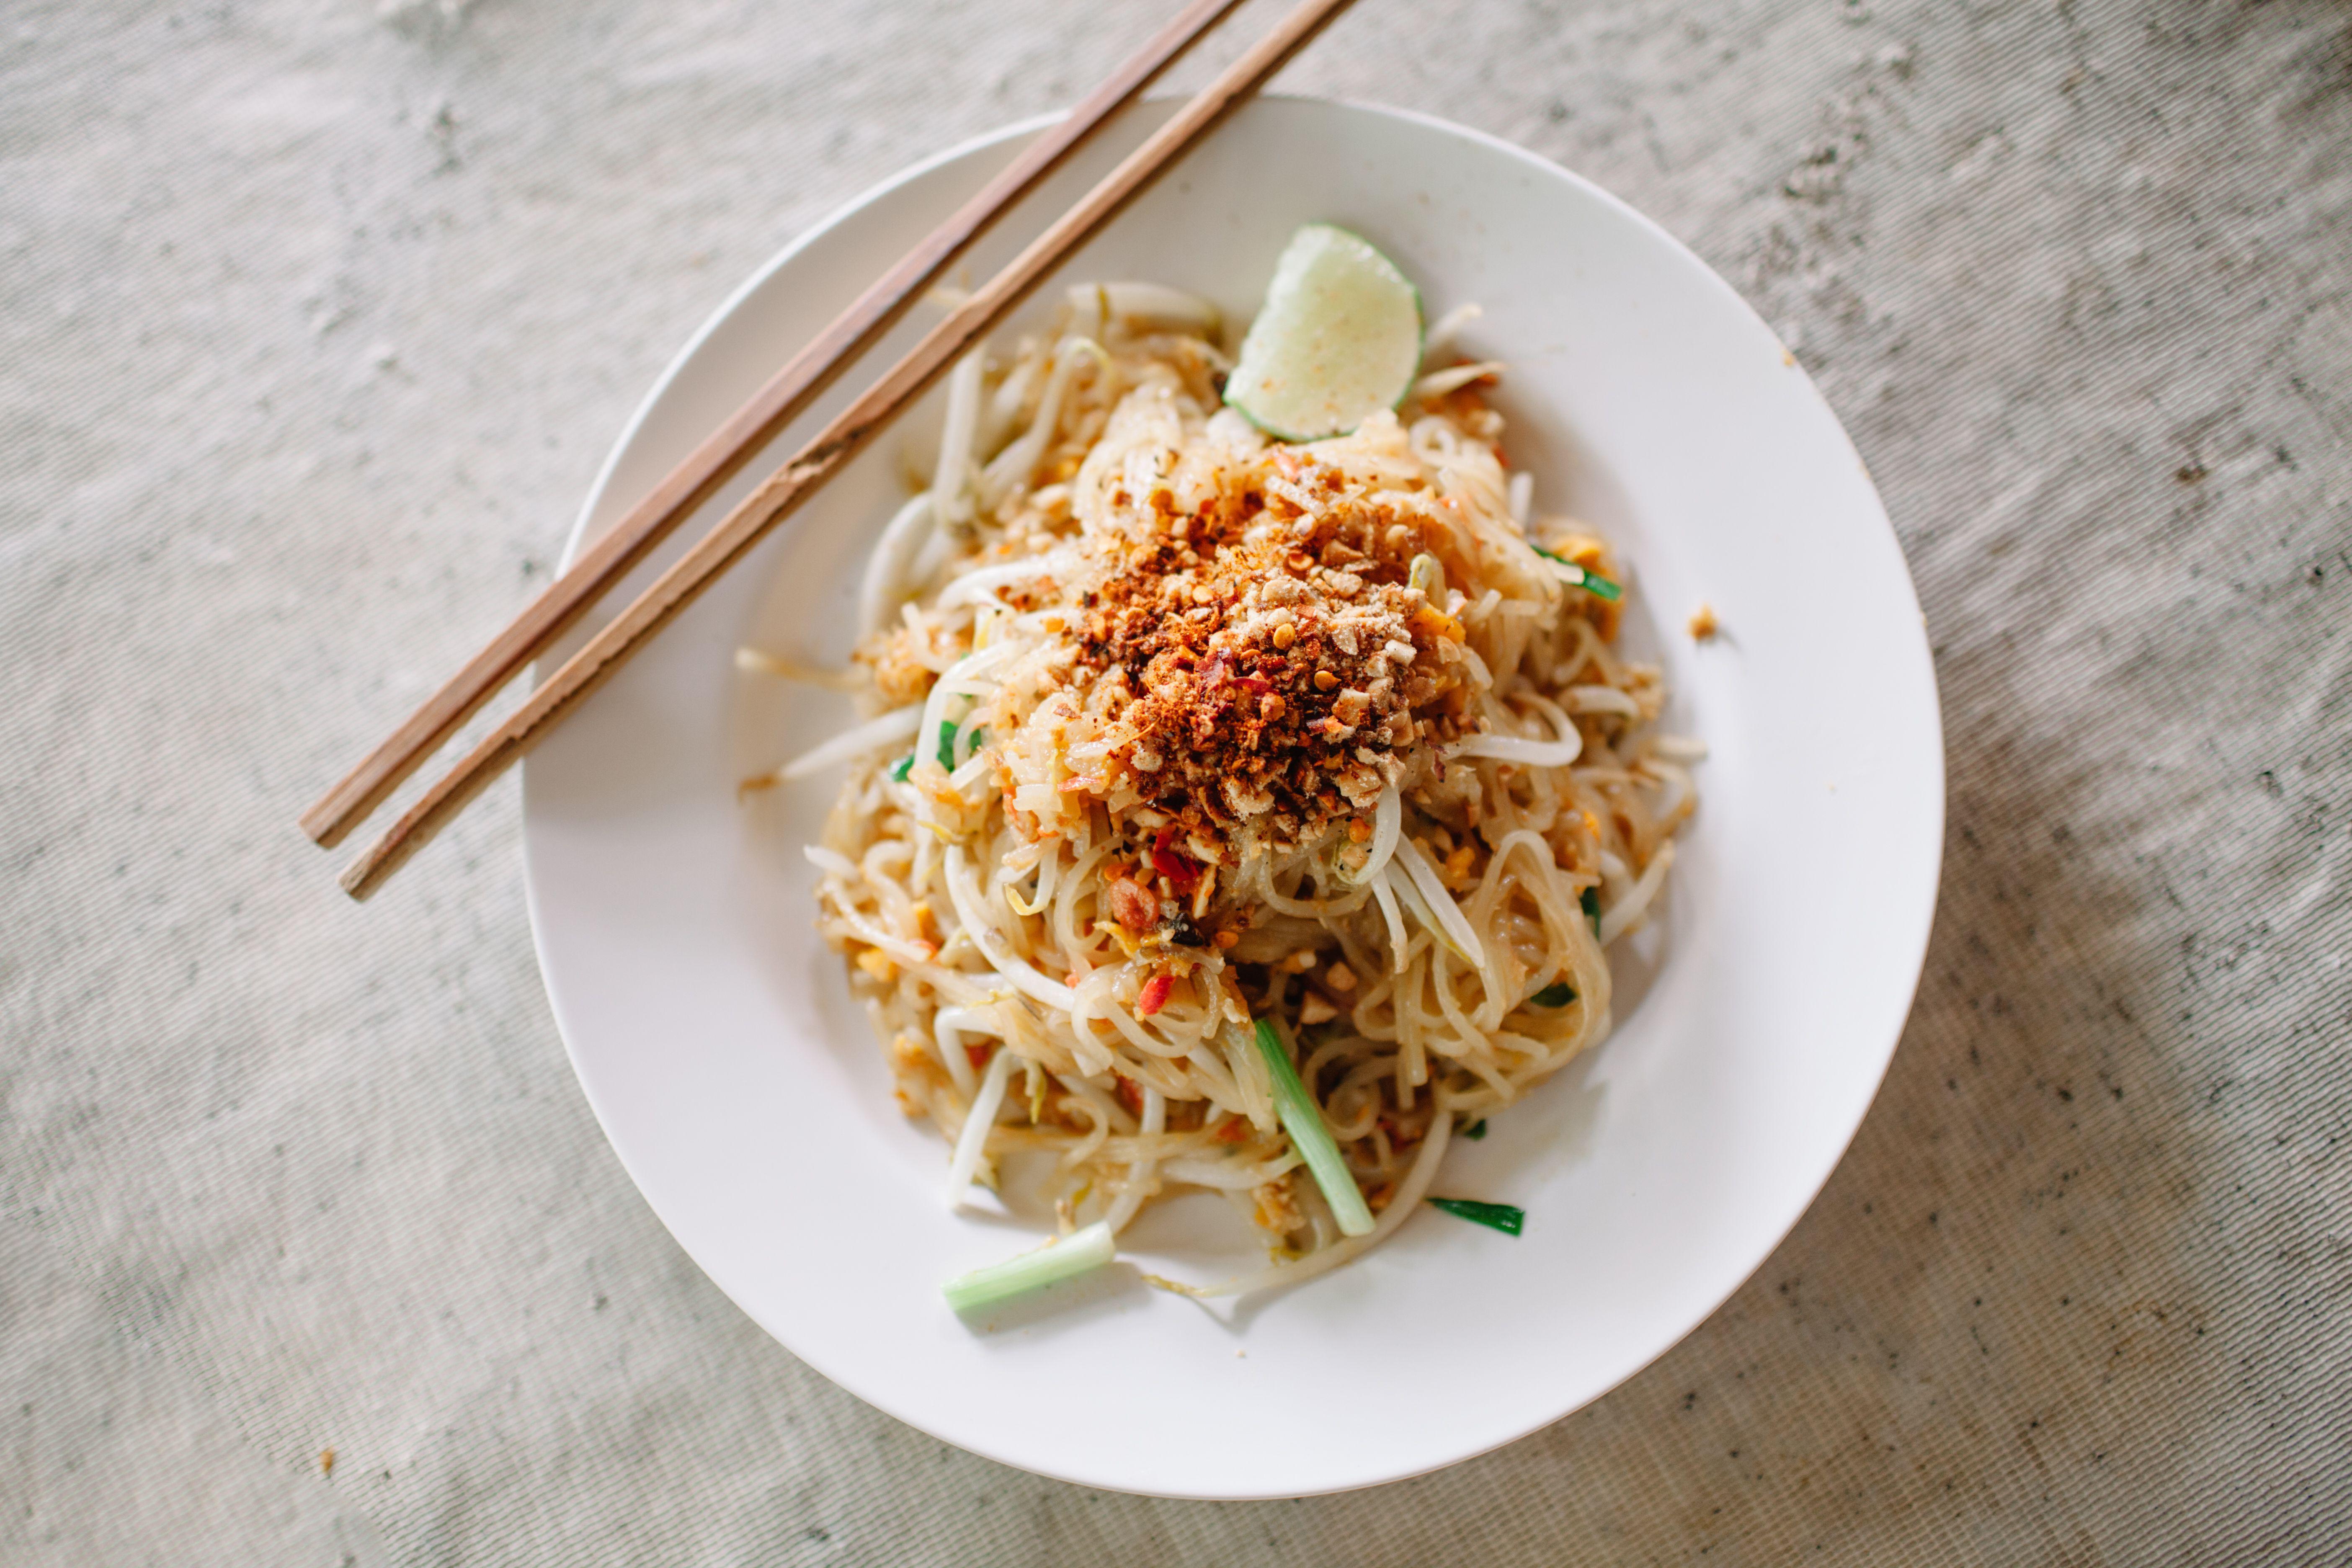 How To Make Restaurant Quality Pad Thai